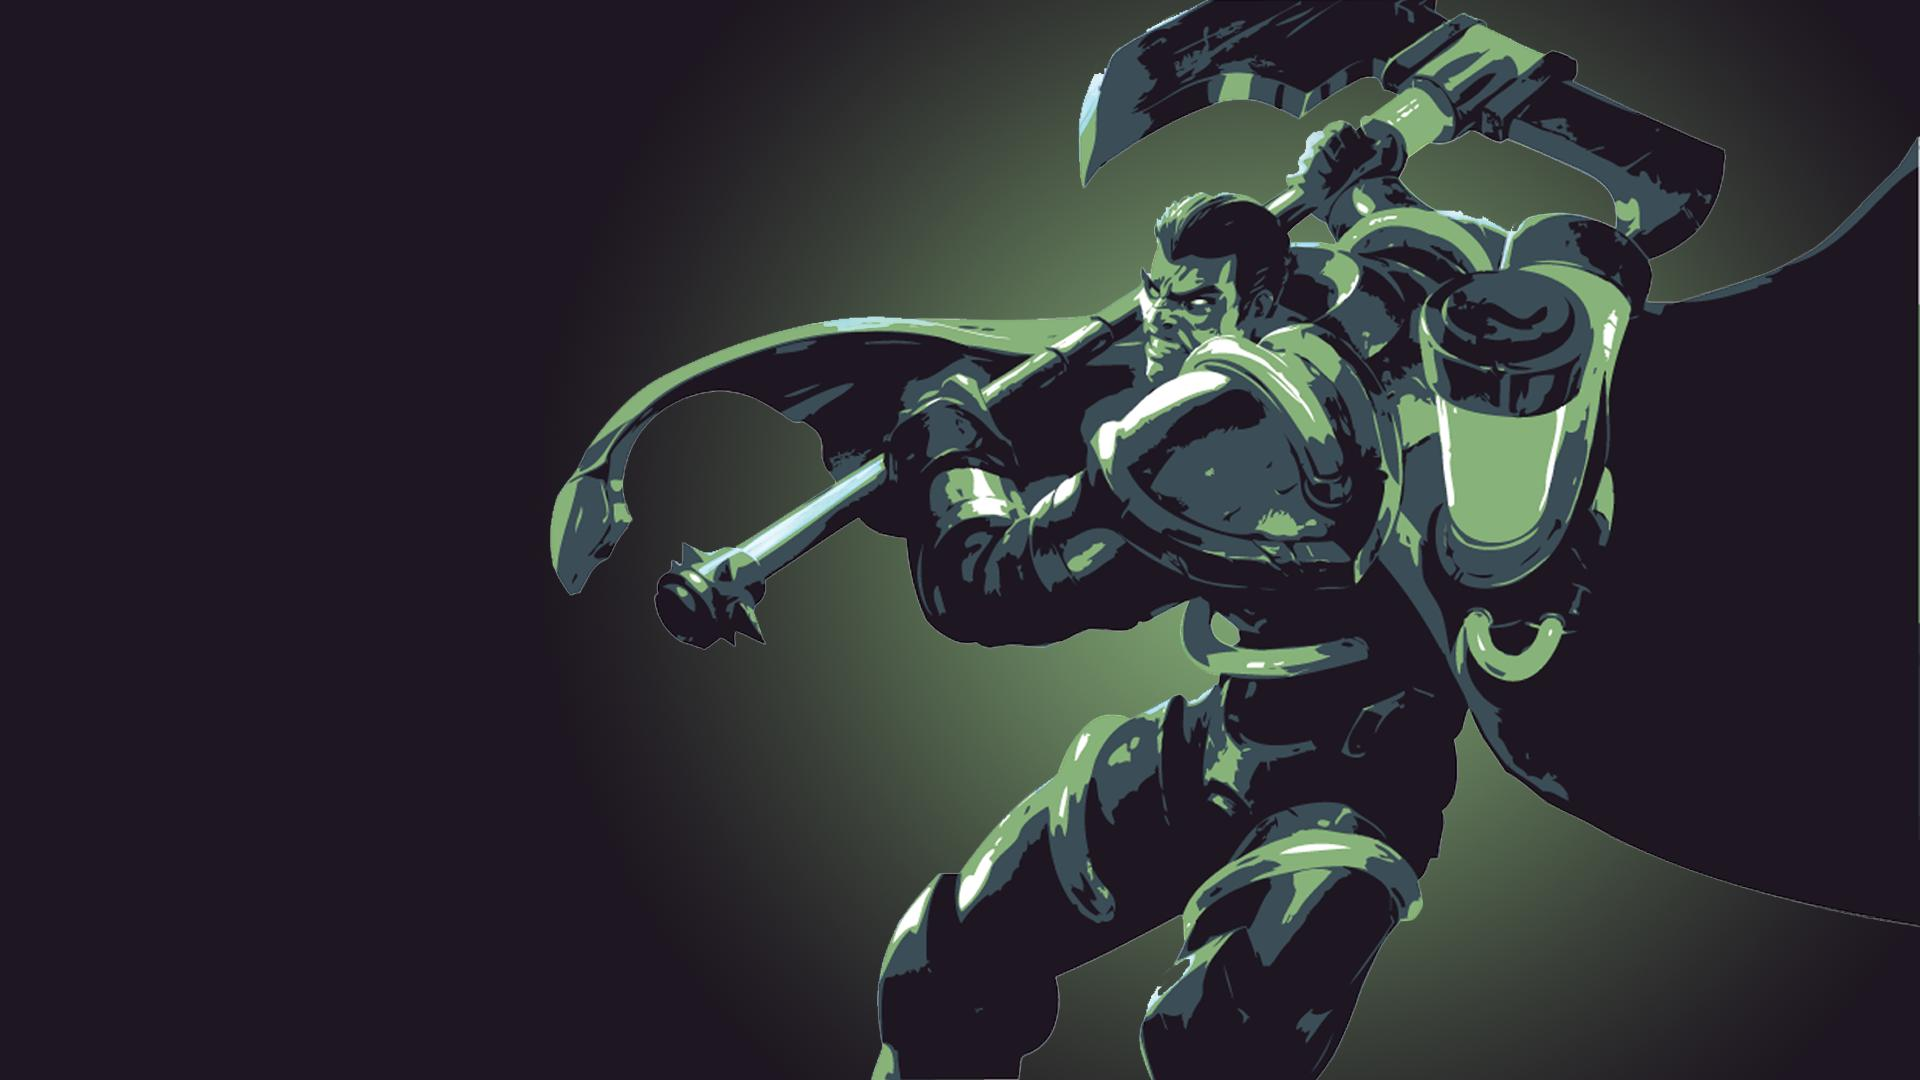 Bioforge Darius Minimalistic wallpaper